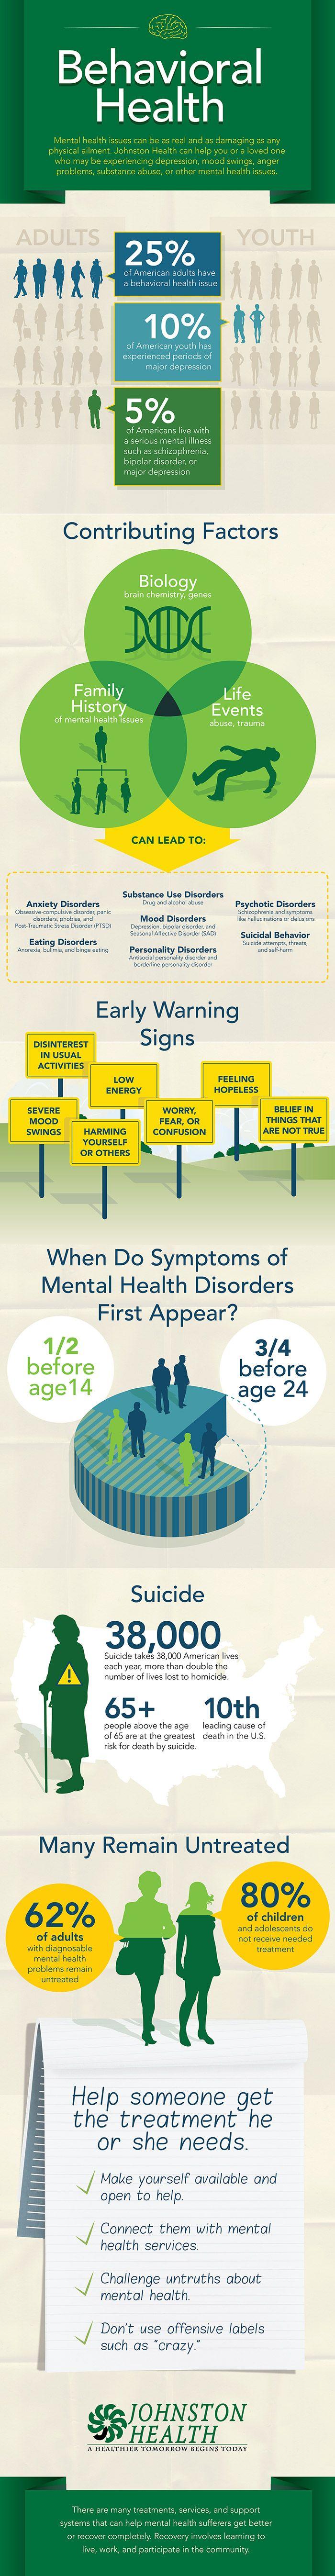 Behavioural and mental health infographic - http://blog.johnstonhealth.org/wp-content/uploads/2013/07/BehavioralHelath-Infographic.jpg